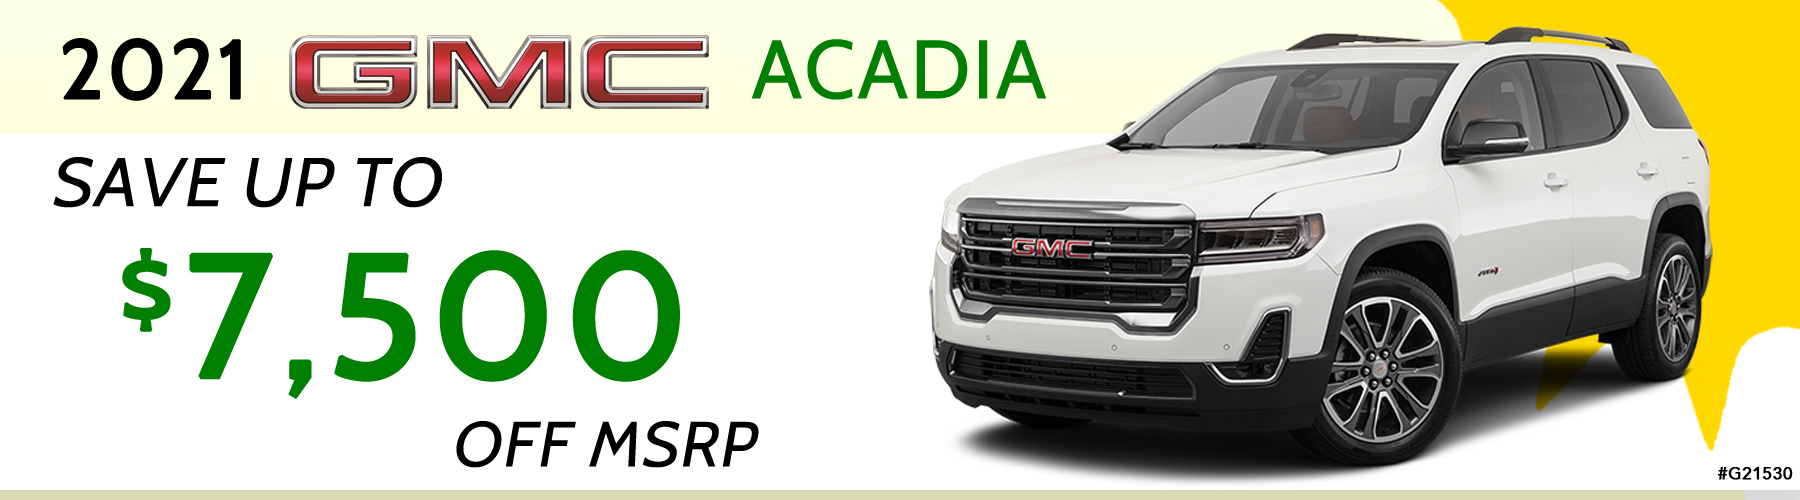 Acadia Offer